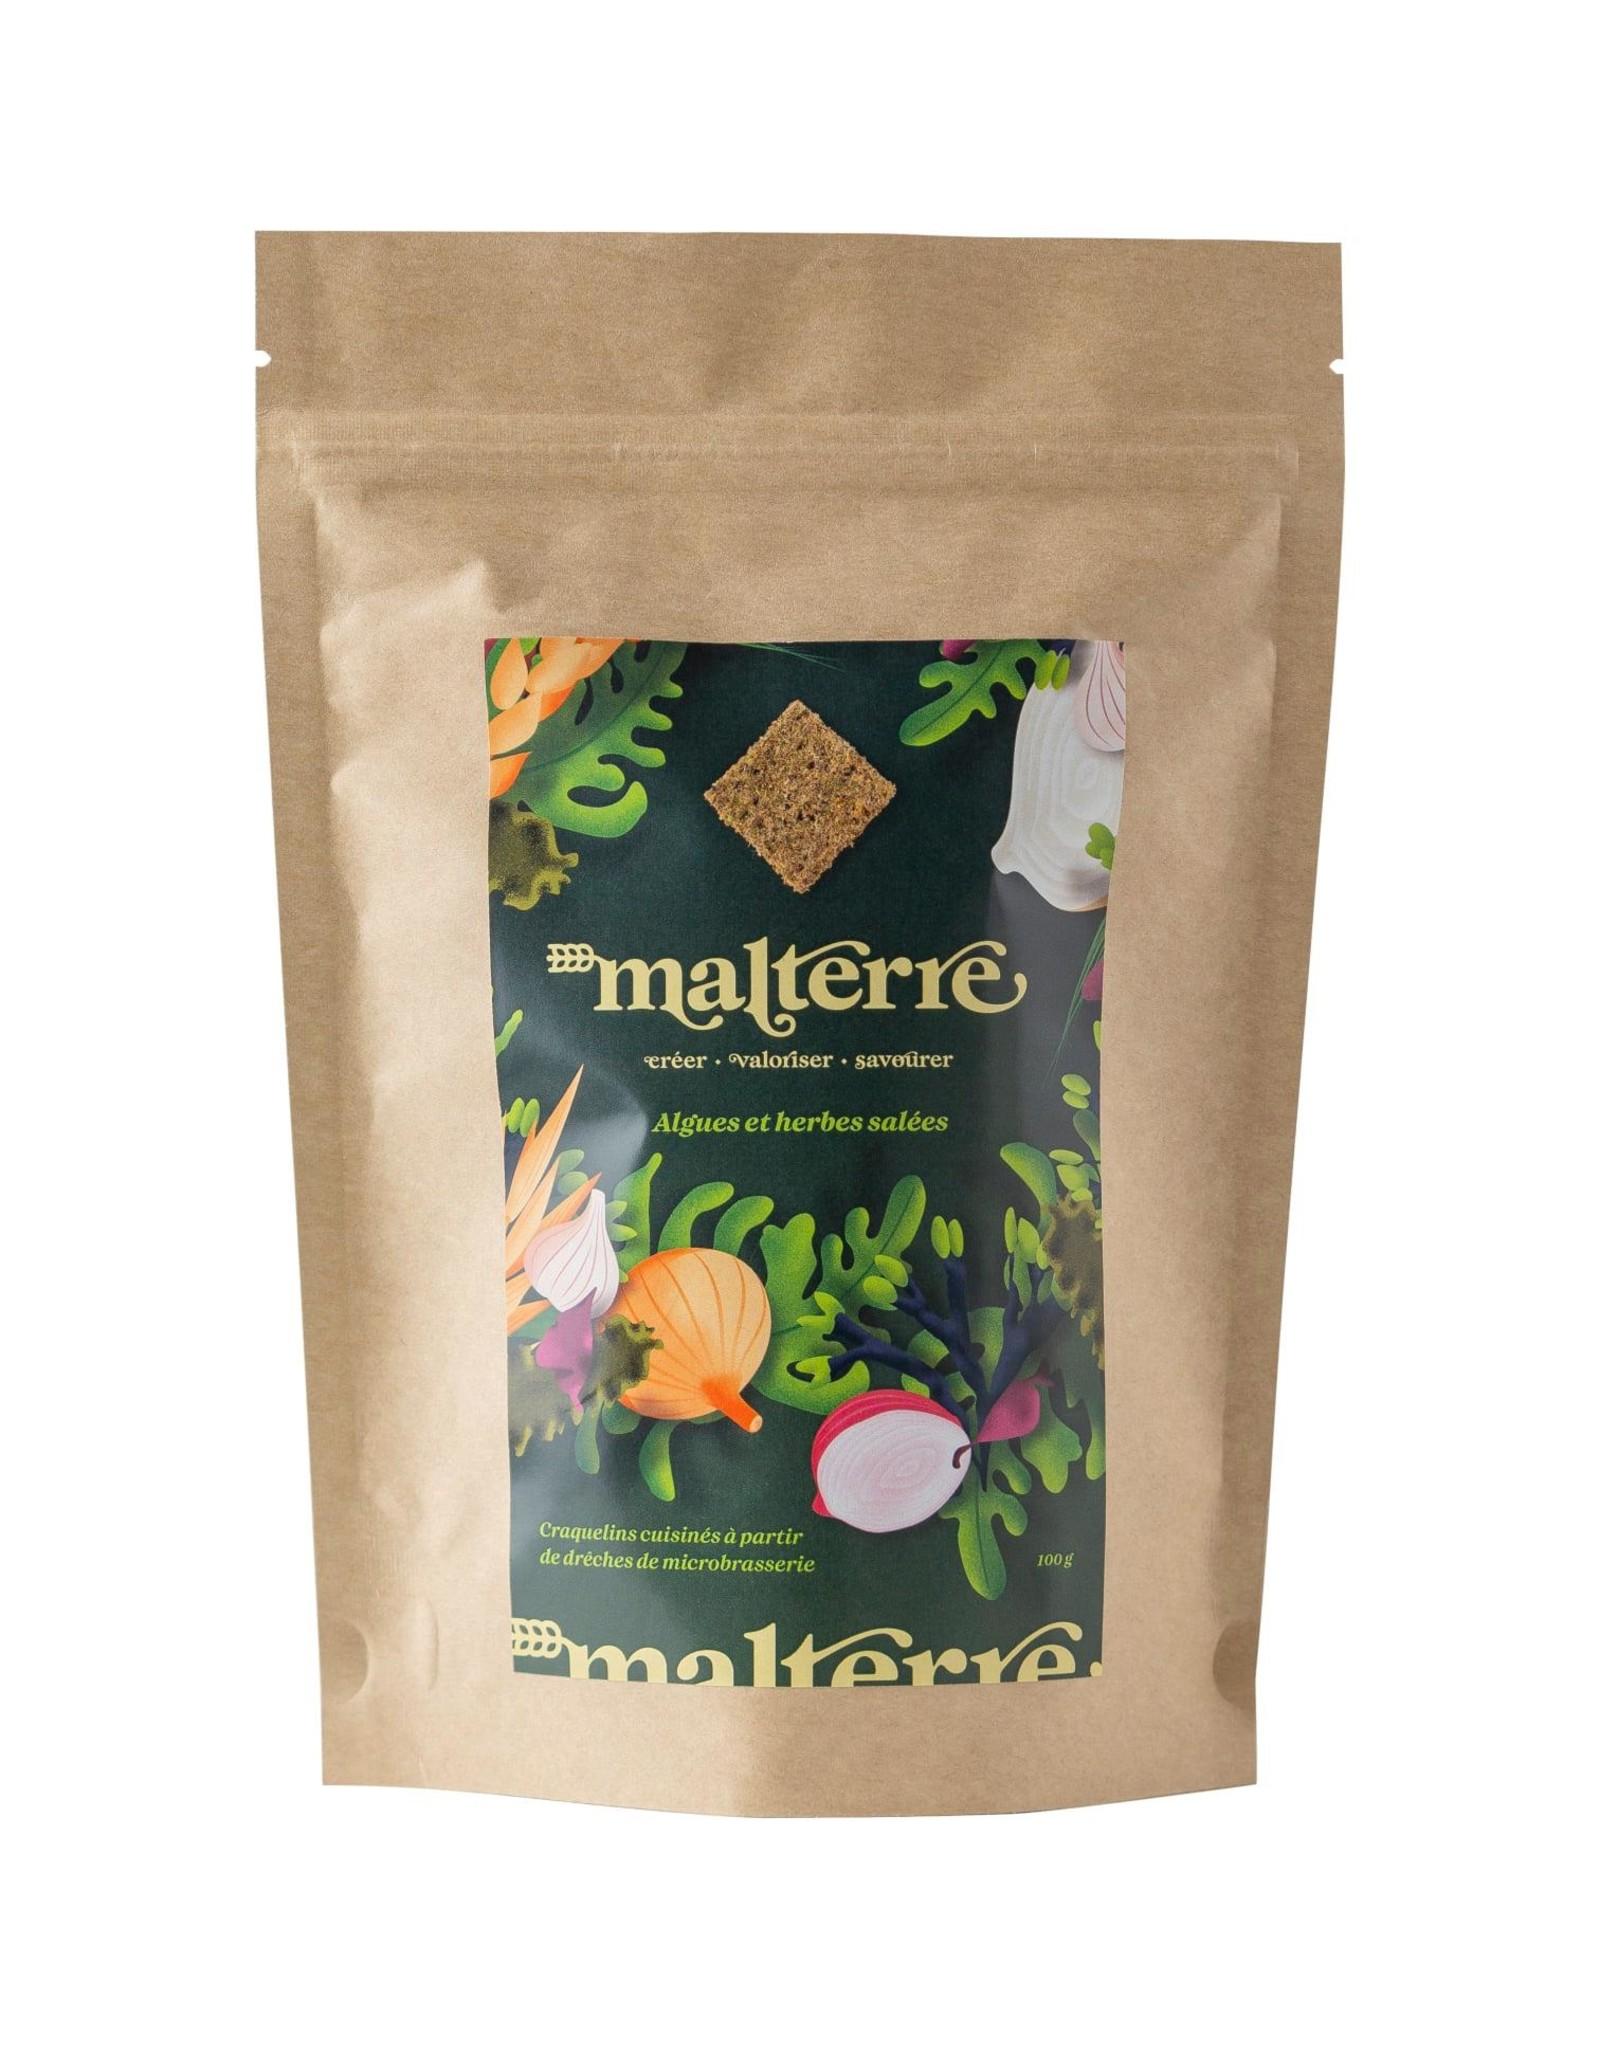 Malterre Malterre - Craquelins, Algues et Herbes Salées (100g)